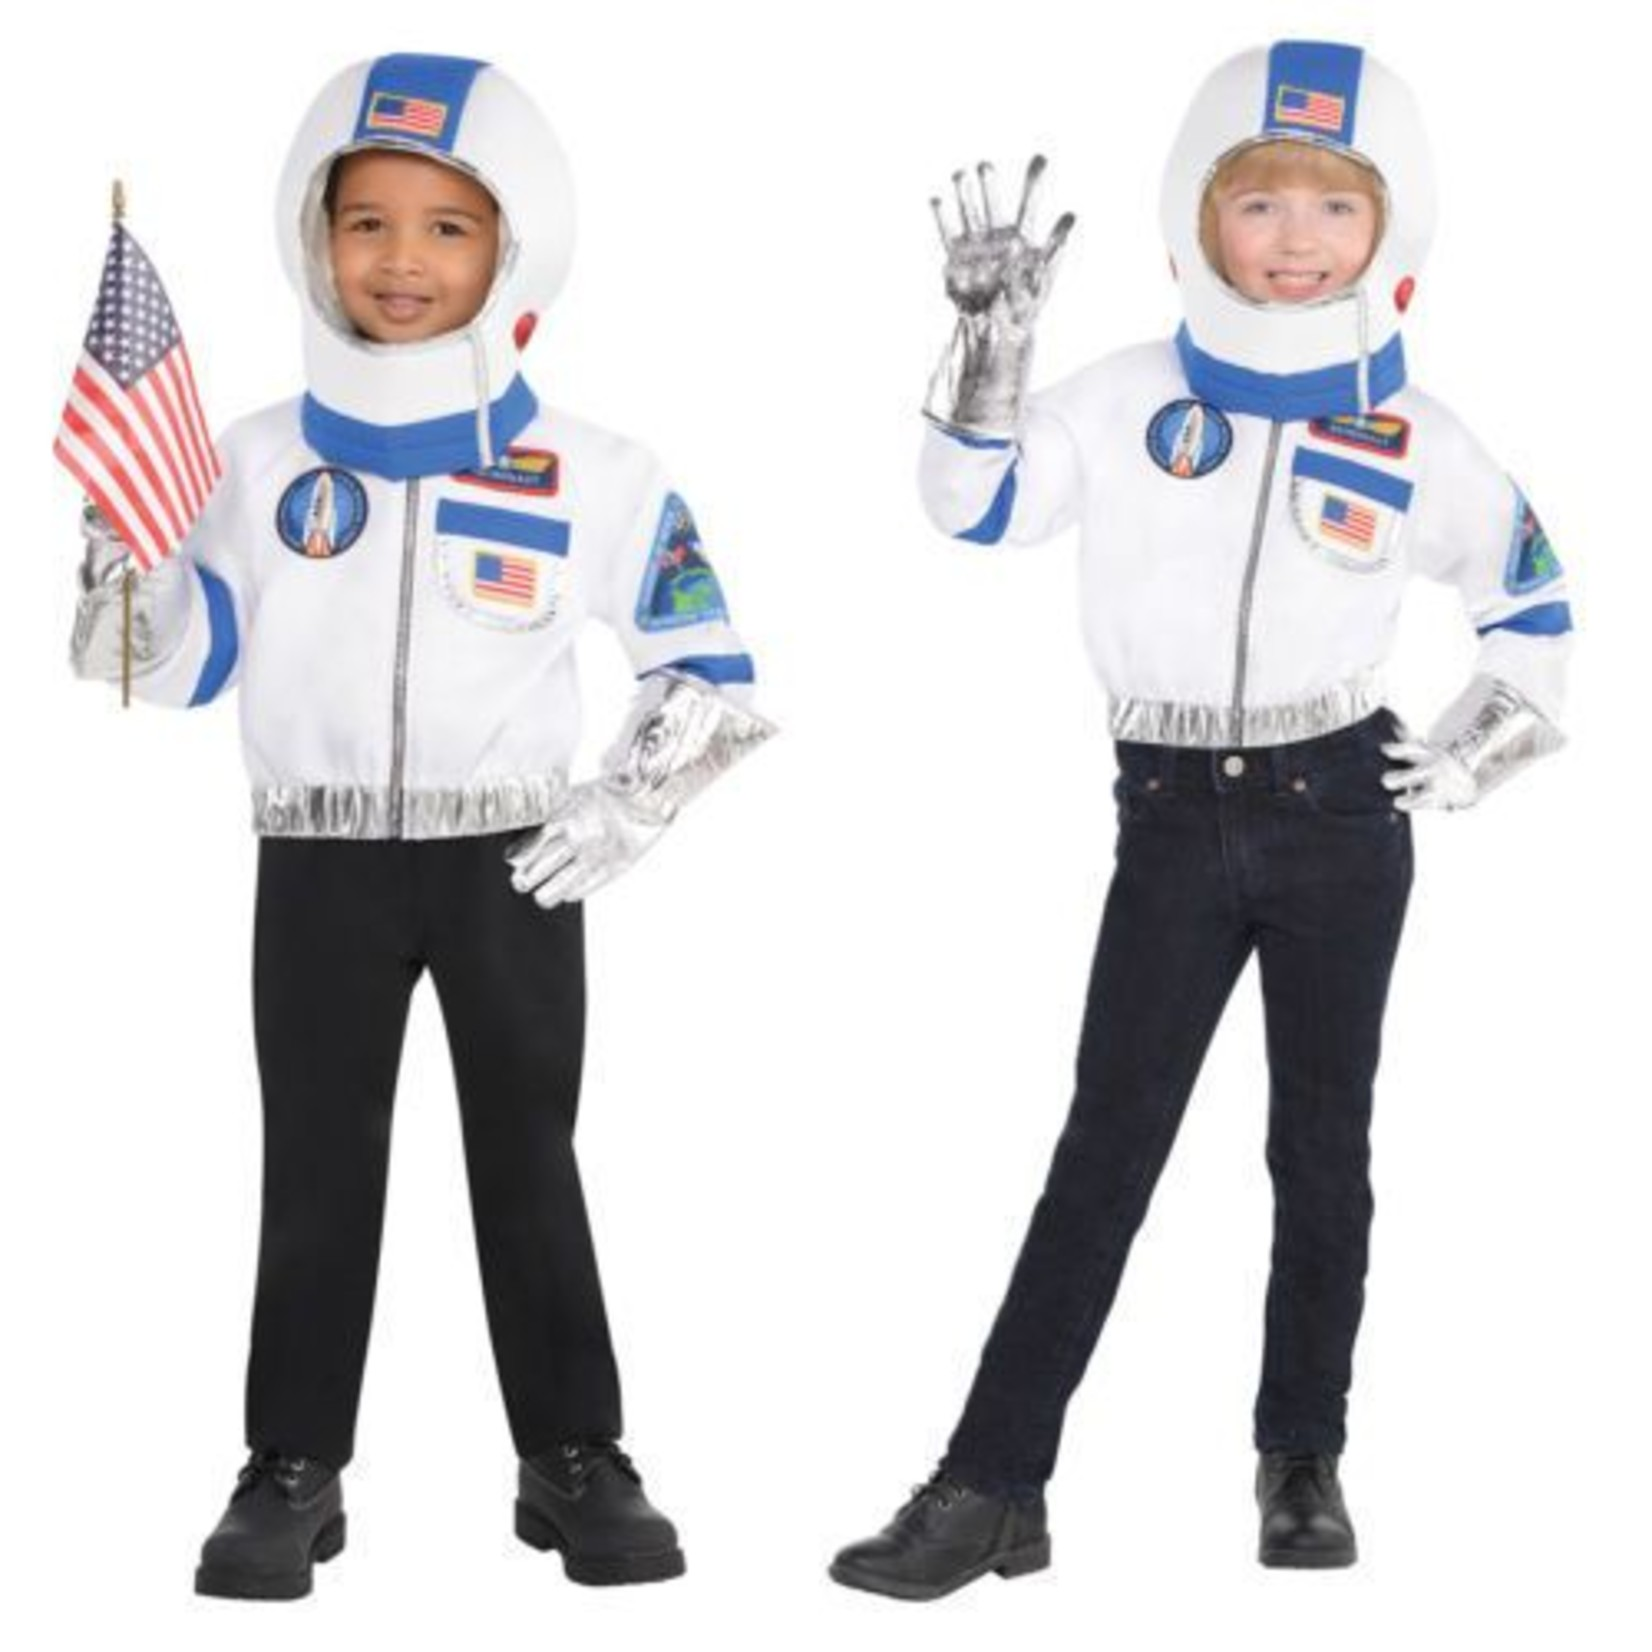 Astronaut Kit-Amazing ME!-Child Small 4-6